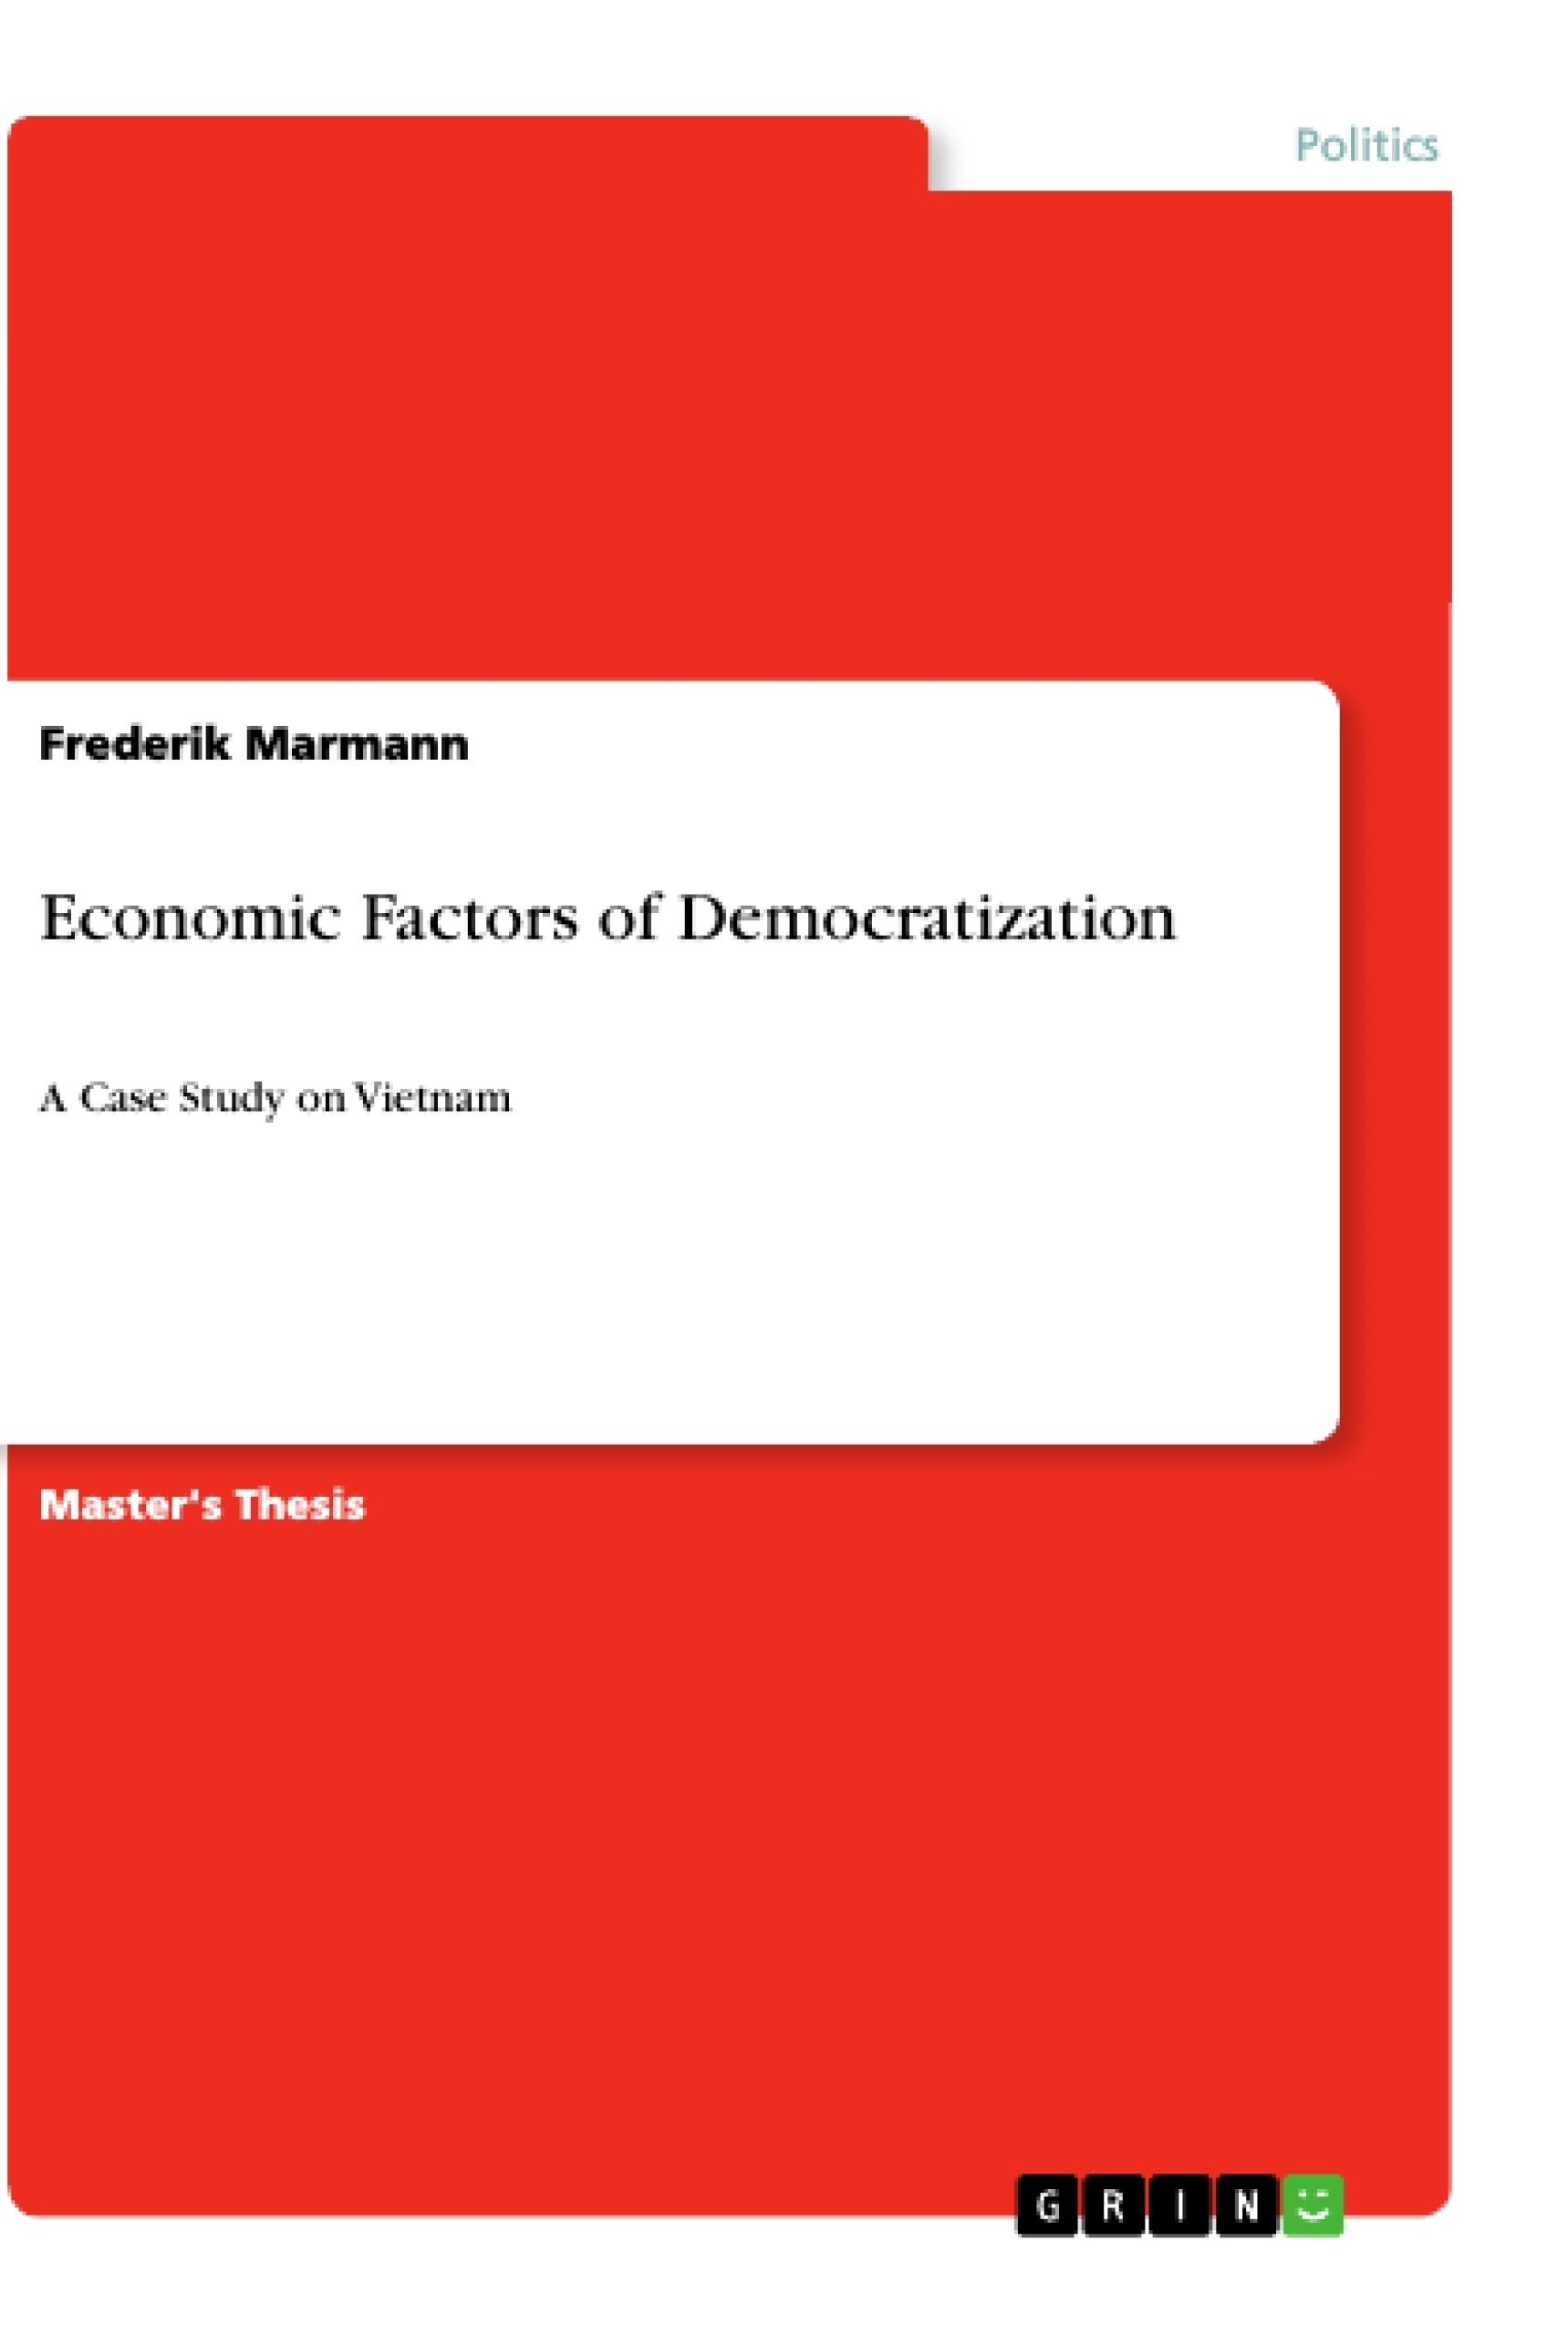 Title: Economic Factors of Democratization